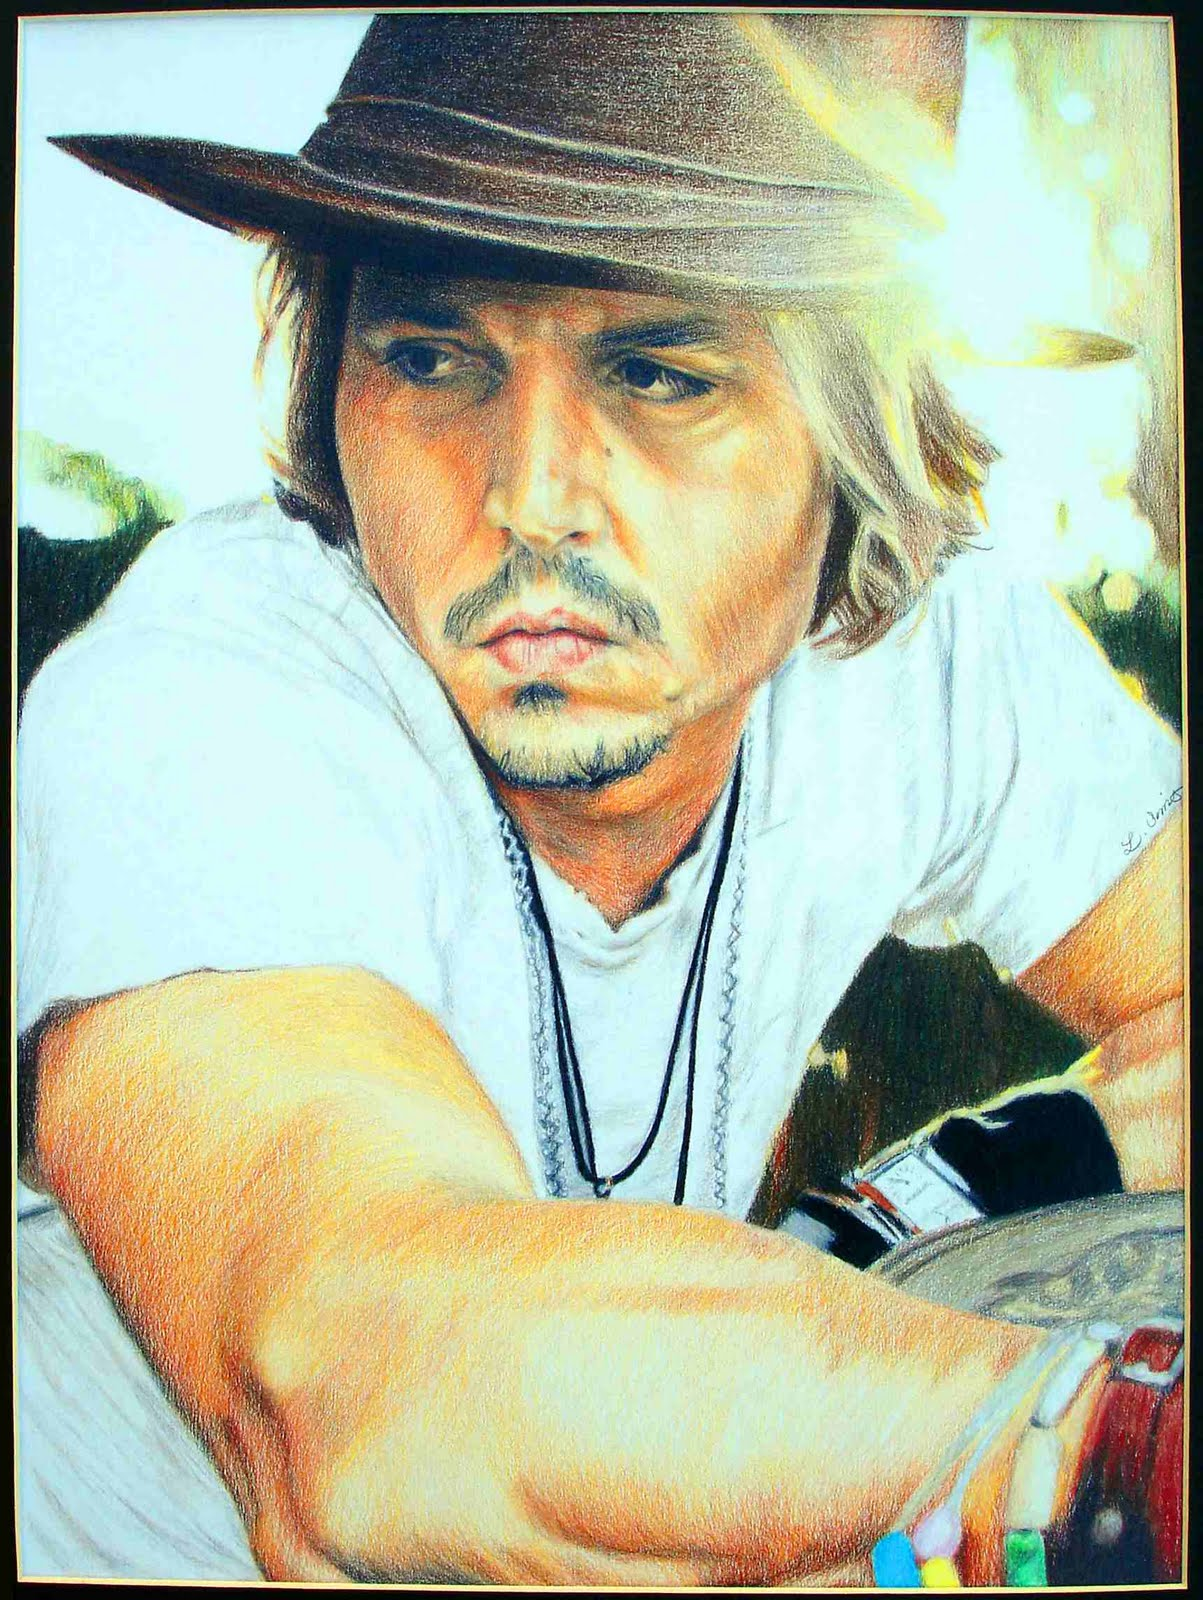 http://1.bp.blogspot.com/-ZqYNFXsyWwU/TlR60xqul3I/AAAAAAAAAPQ/tO4ncaA4TZ0/s1600/johnny_depp.jpg